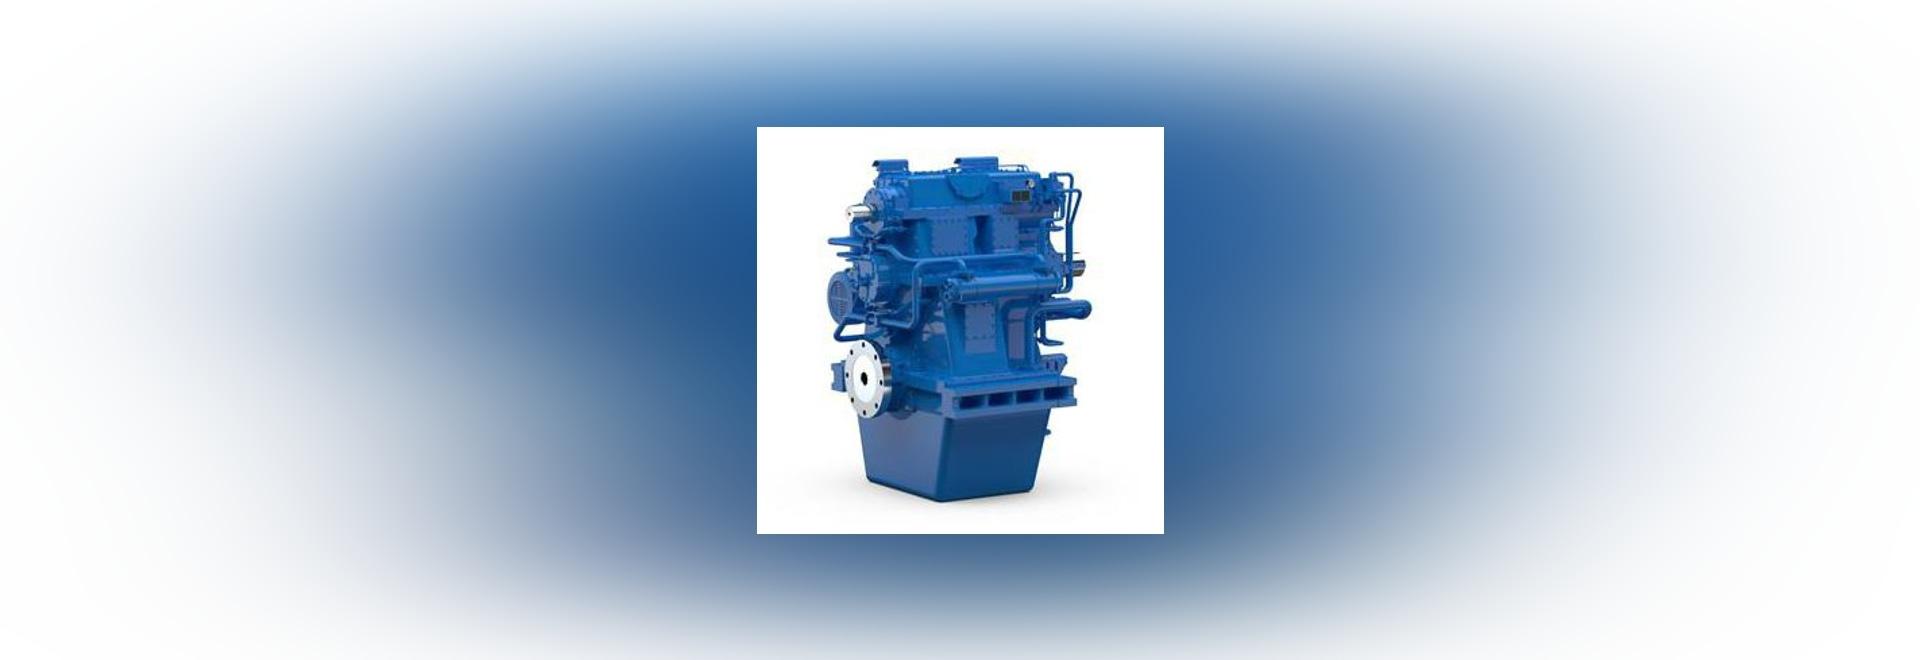 NEW: ship reduction gearbox by Wärtsilä Corporation